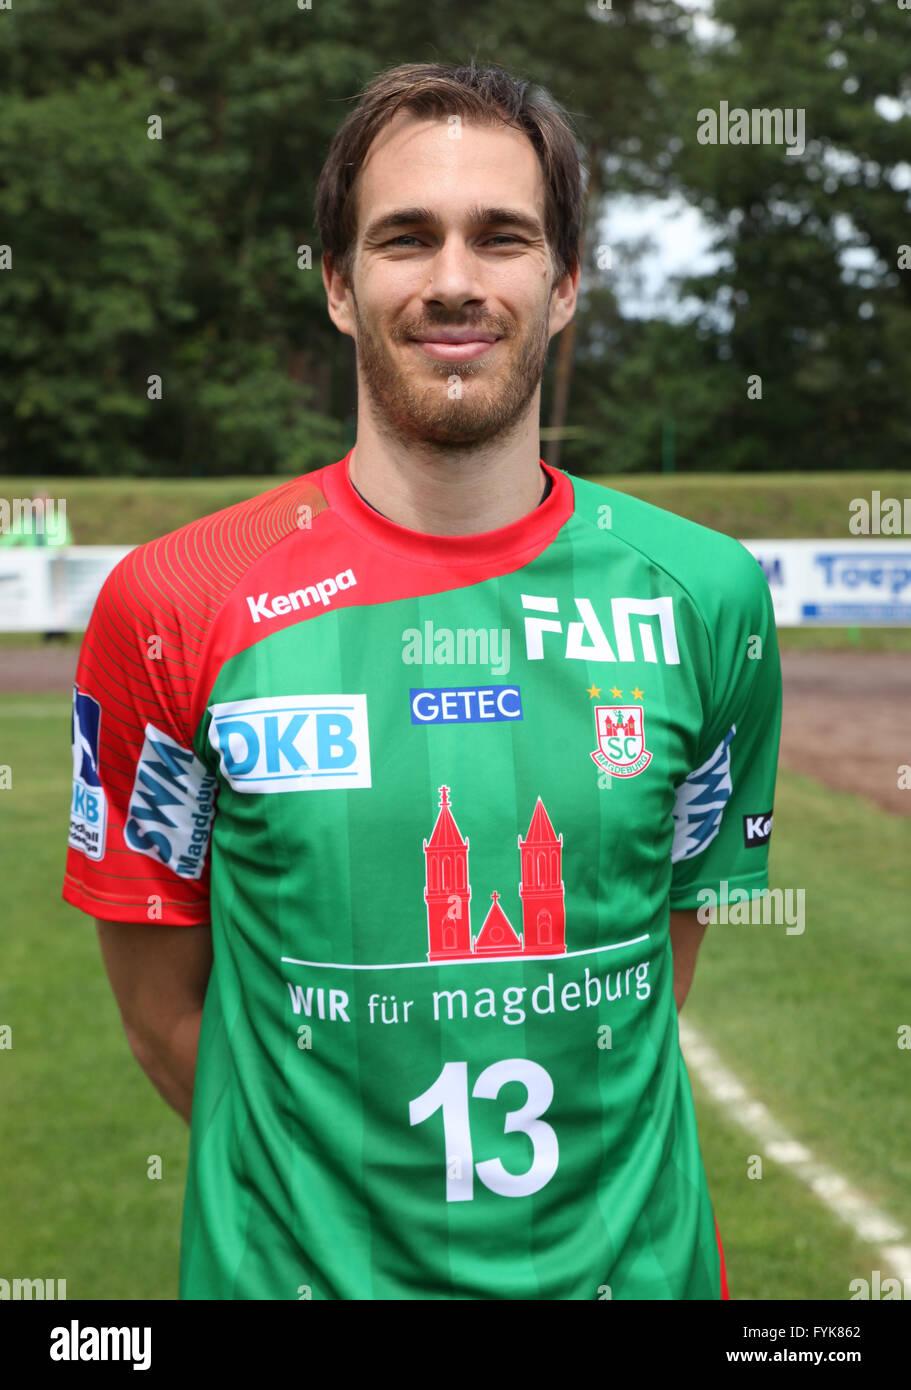 Jure Natek (SC Magdeburg Saison 2014/15) - Stock Image